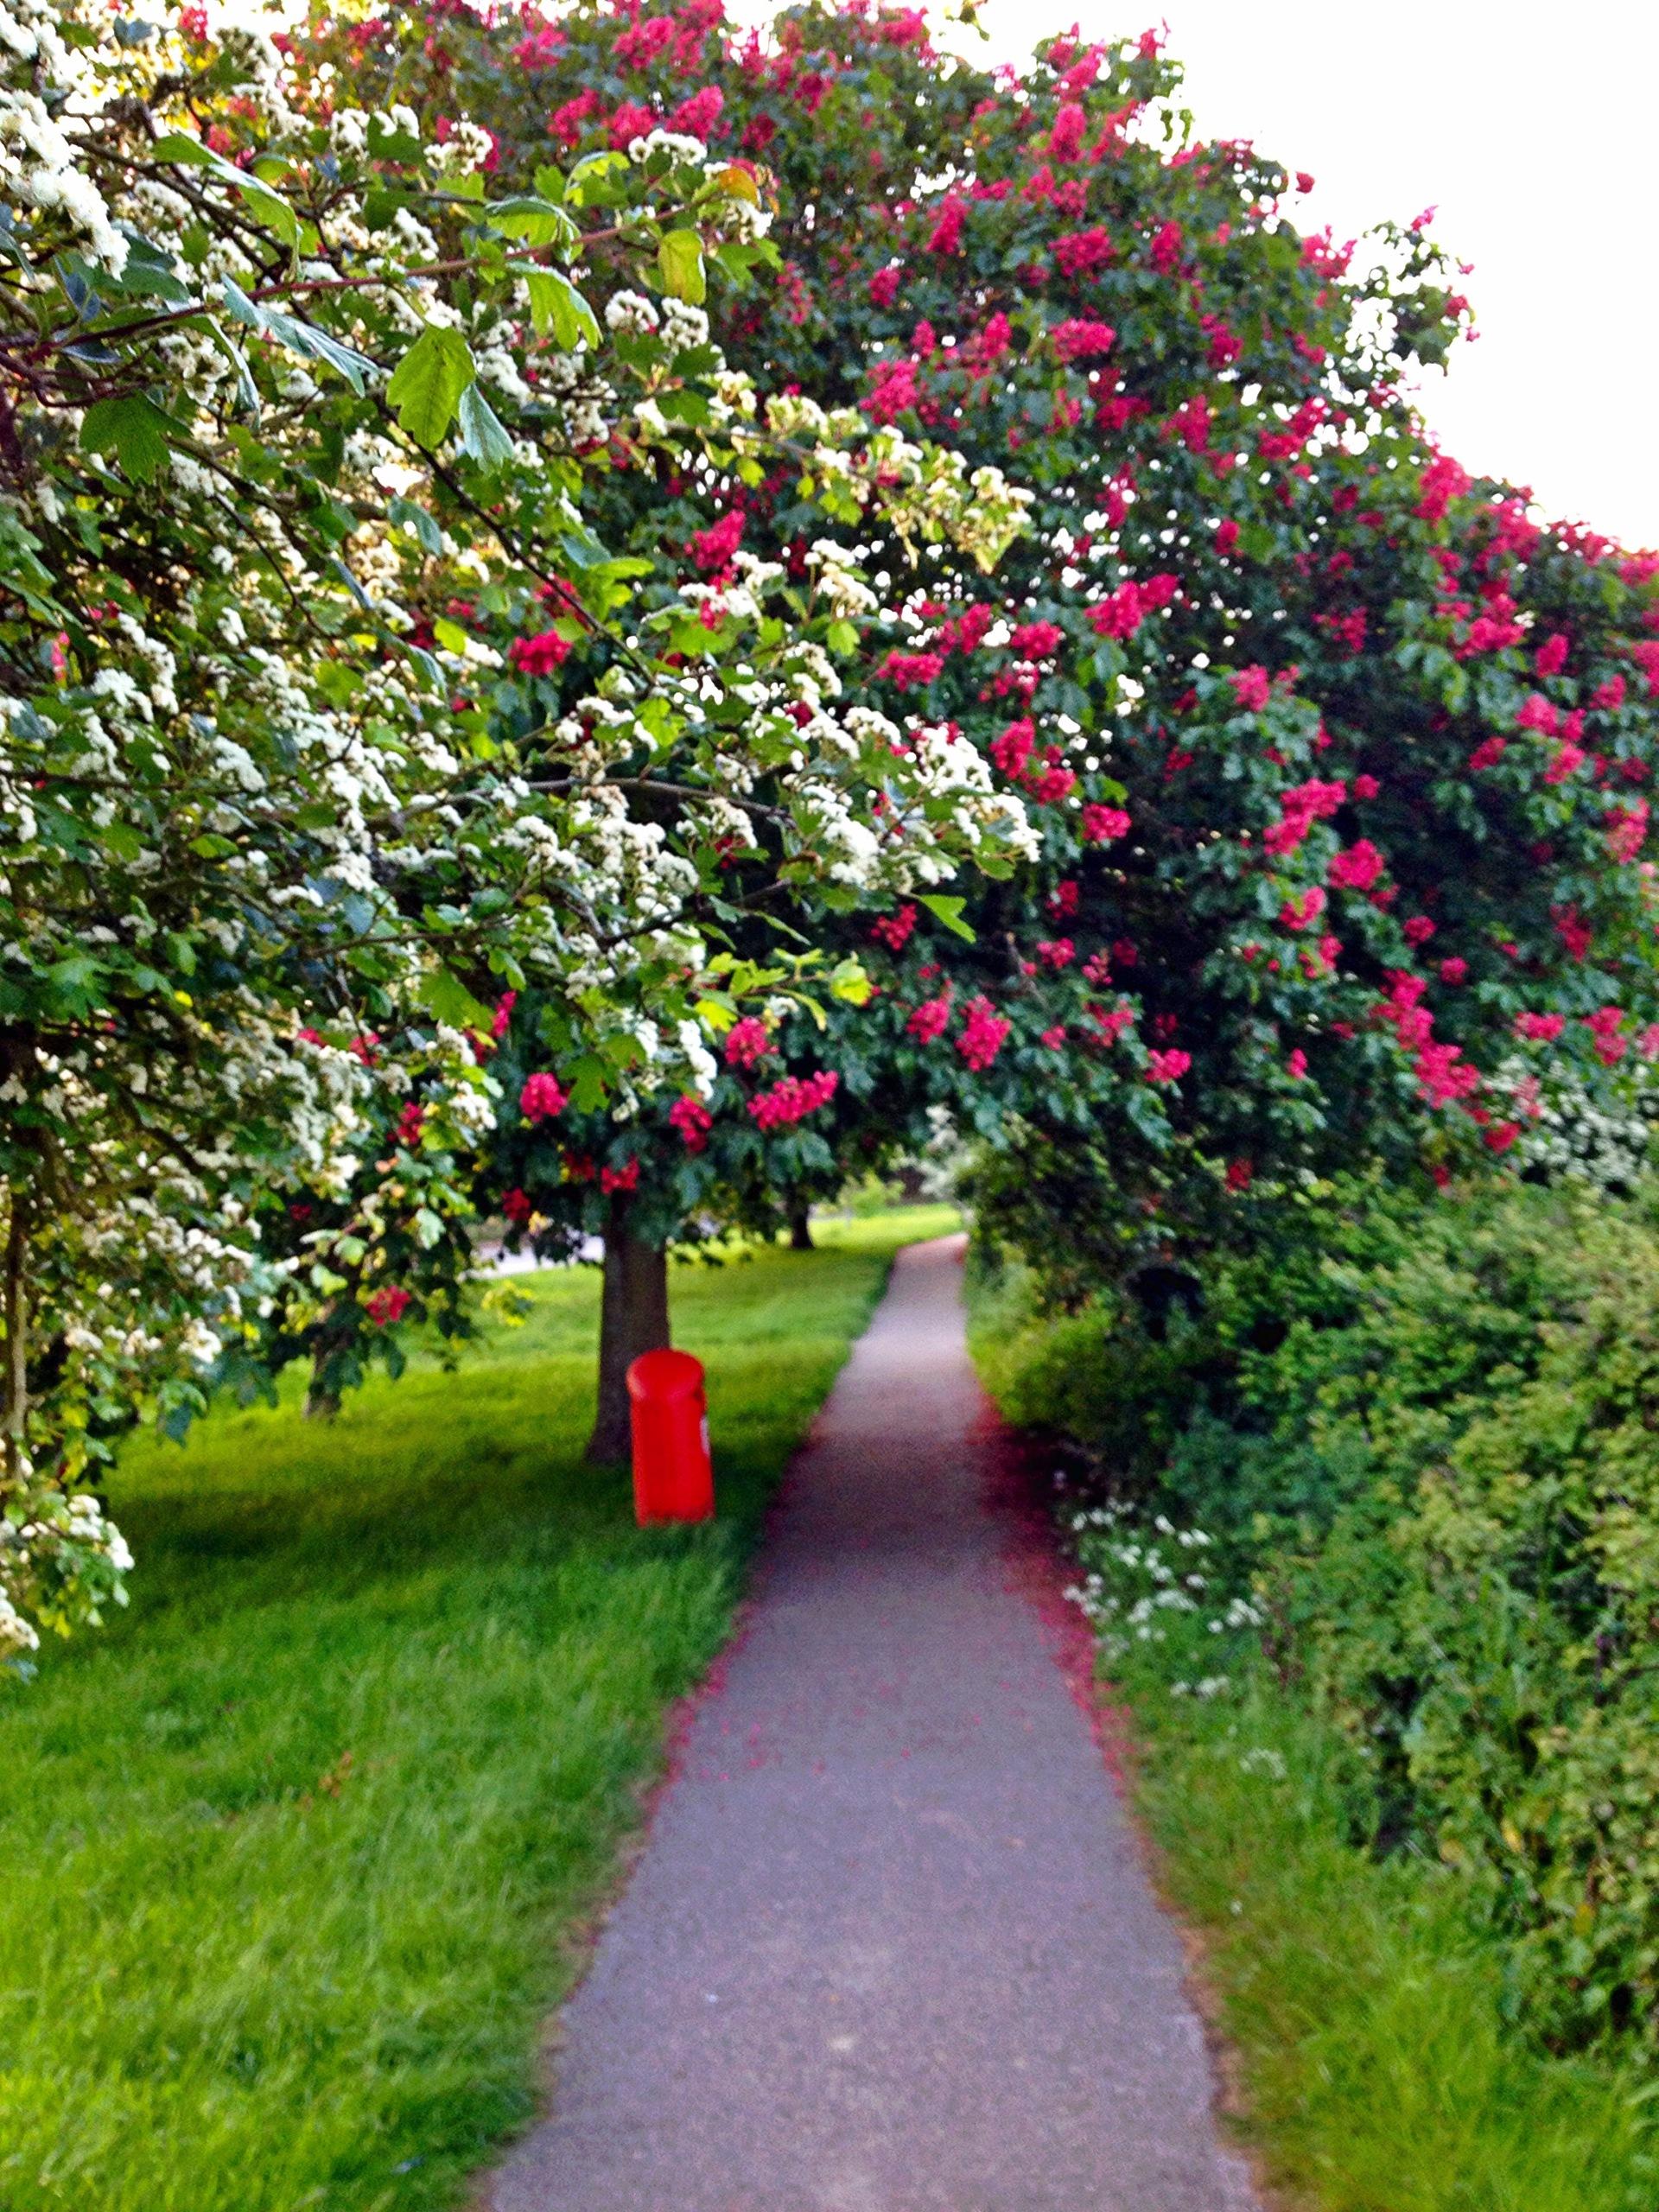 Floerings trees    flowers, nature, footpath, plants